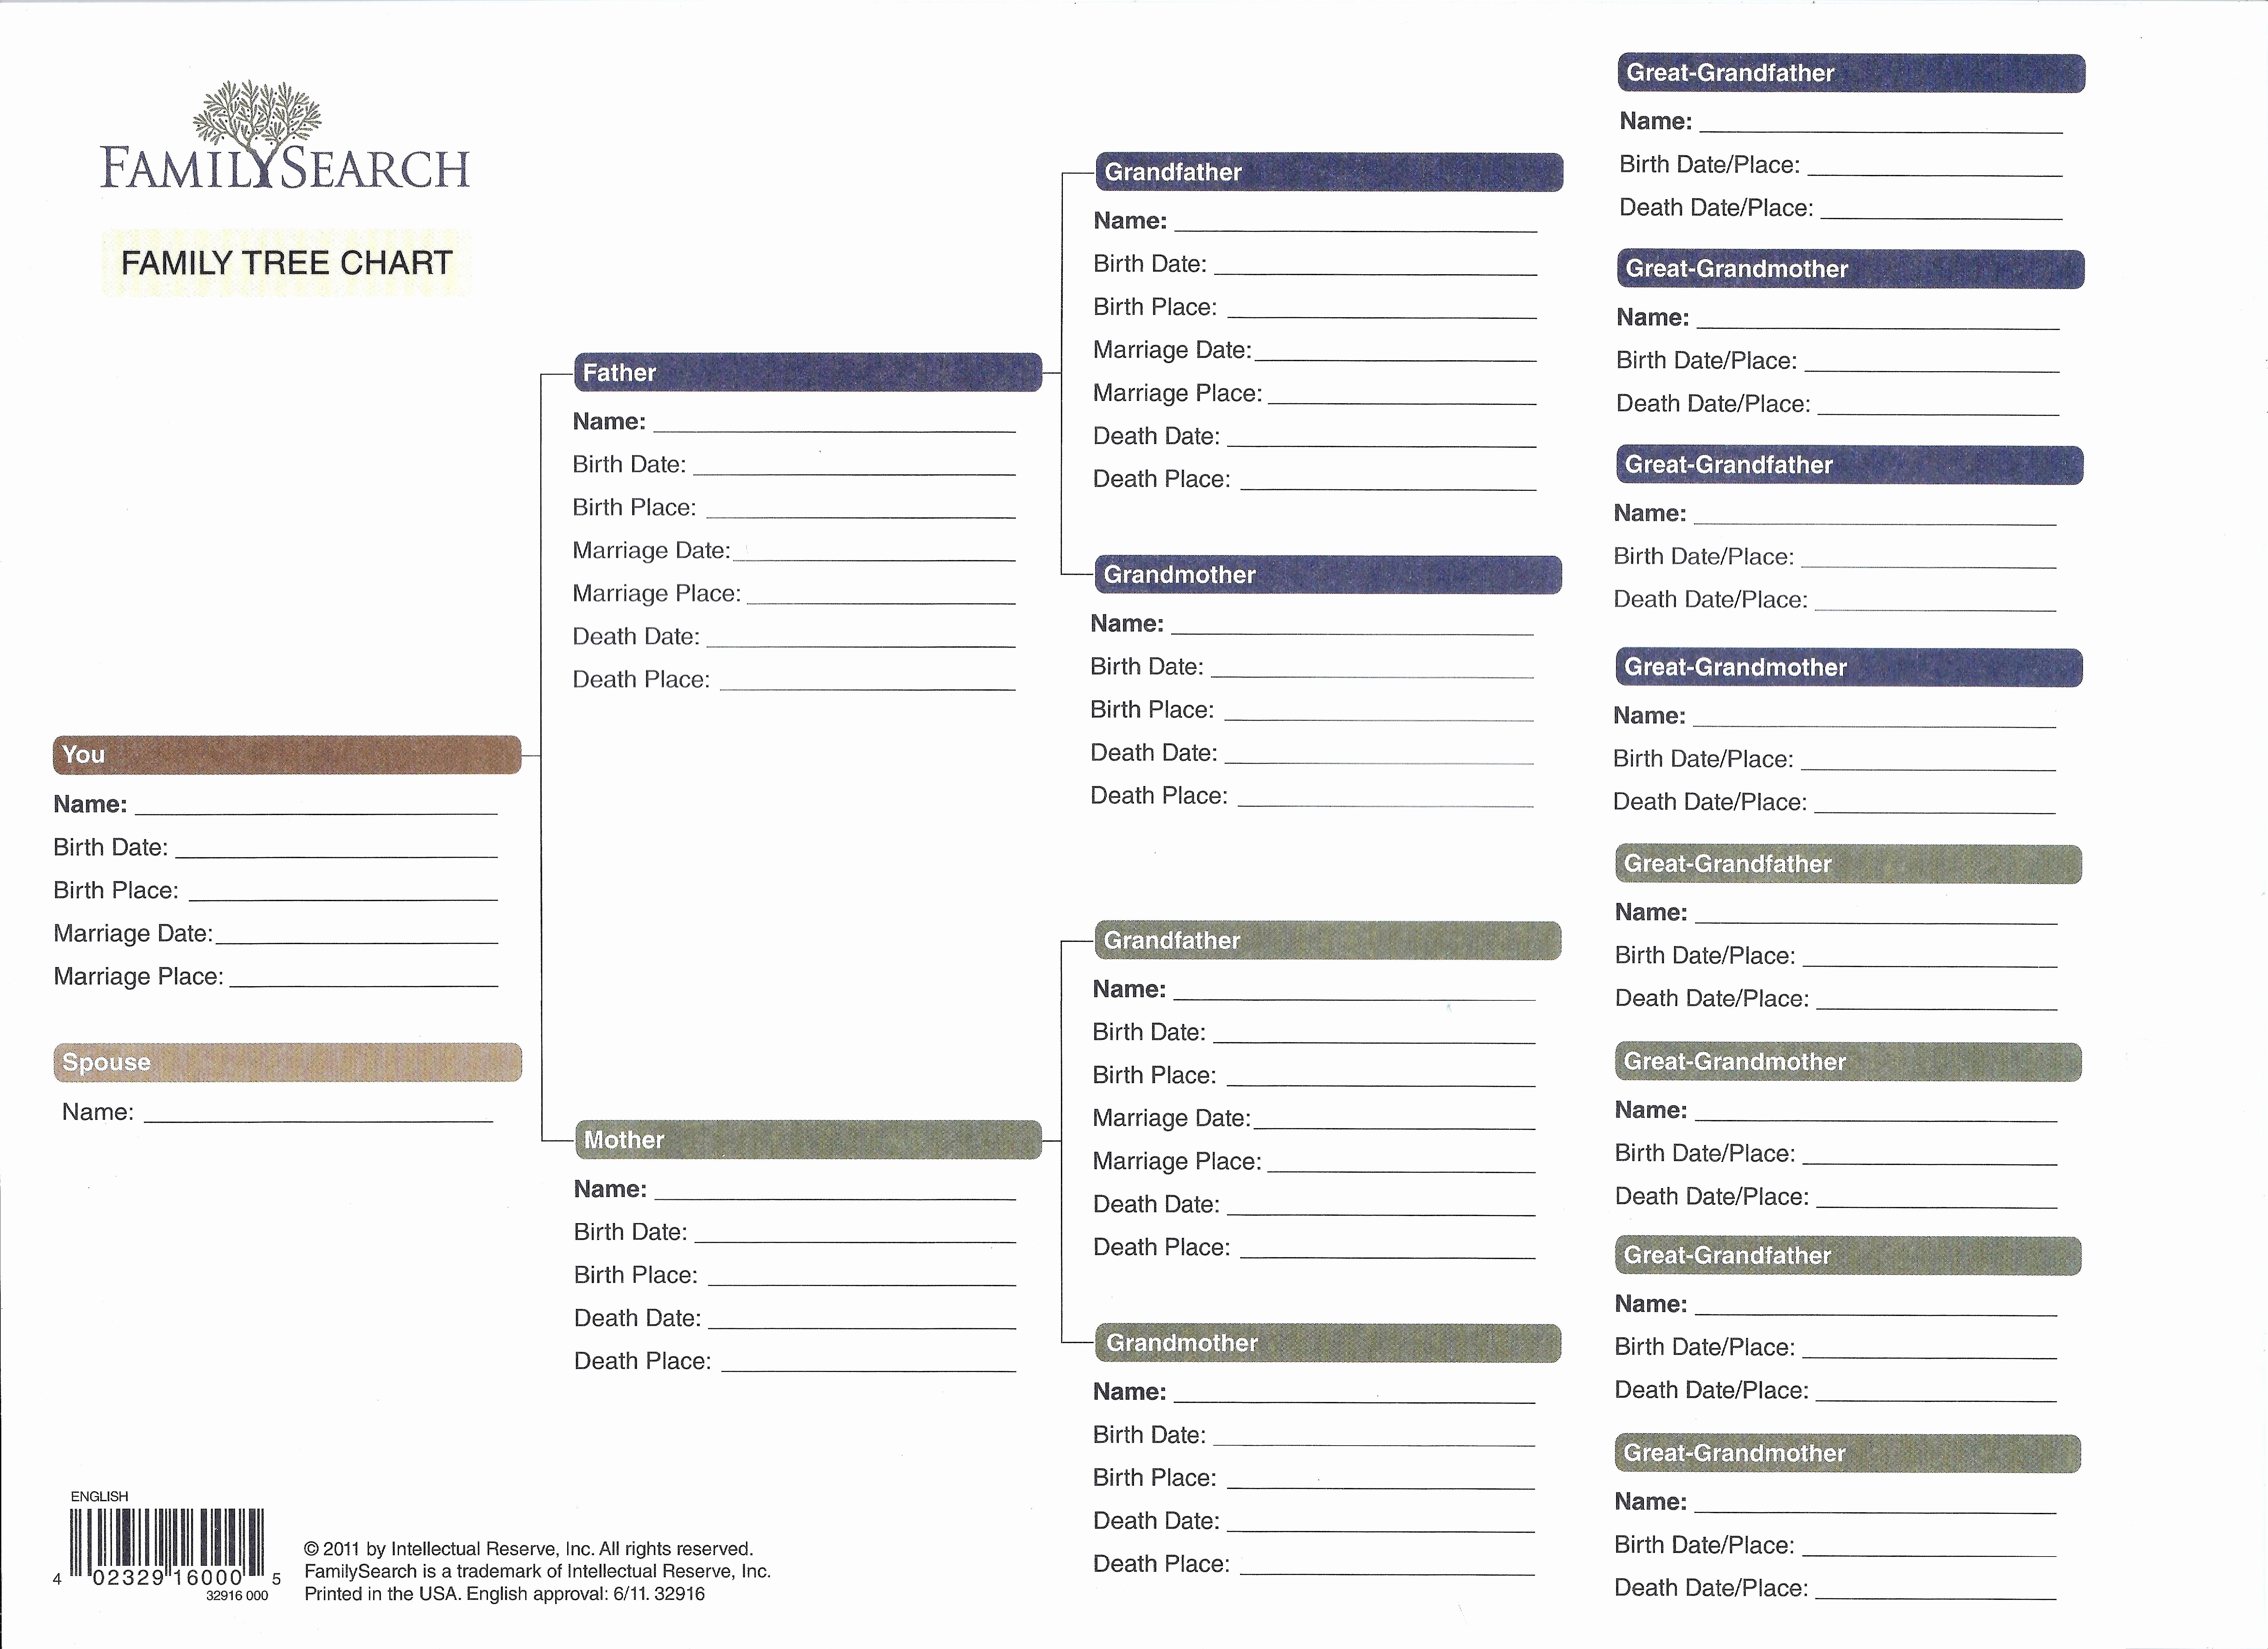 10 Generation Family Tree Excel Elegant 12 13 Family Tree Spreadsheet Template